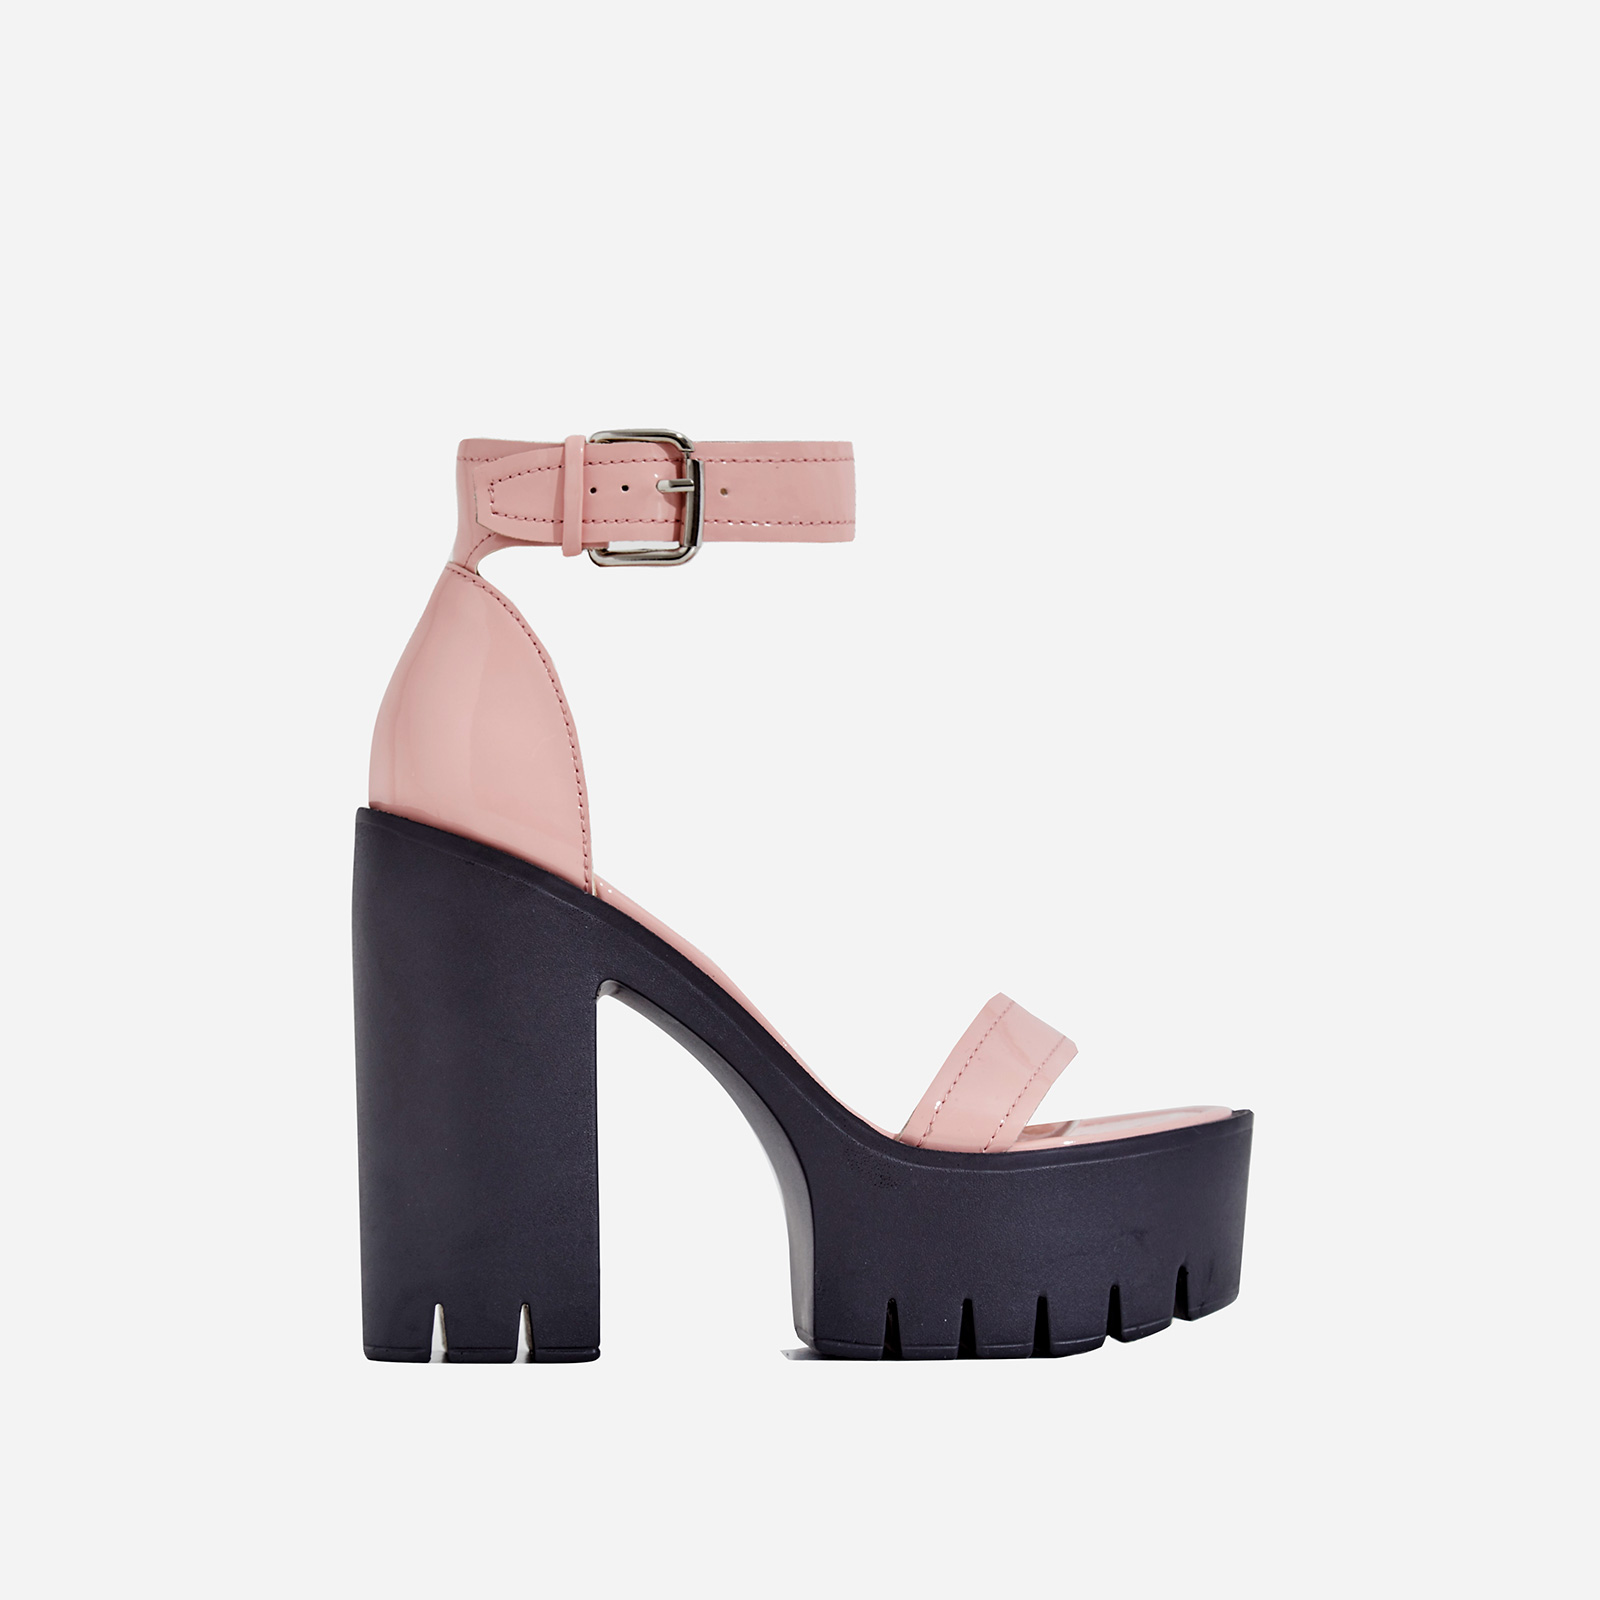 Stormi Platform Cleated Sole Block Heel In Pink Patent